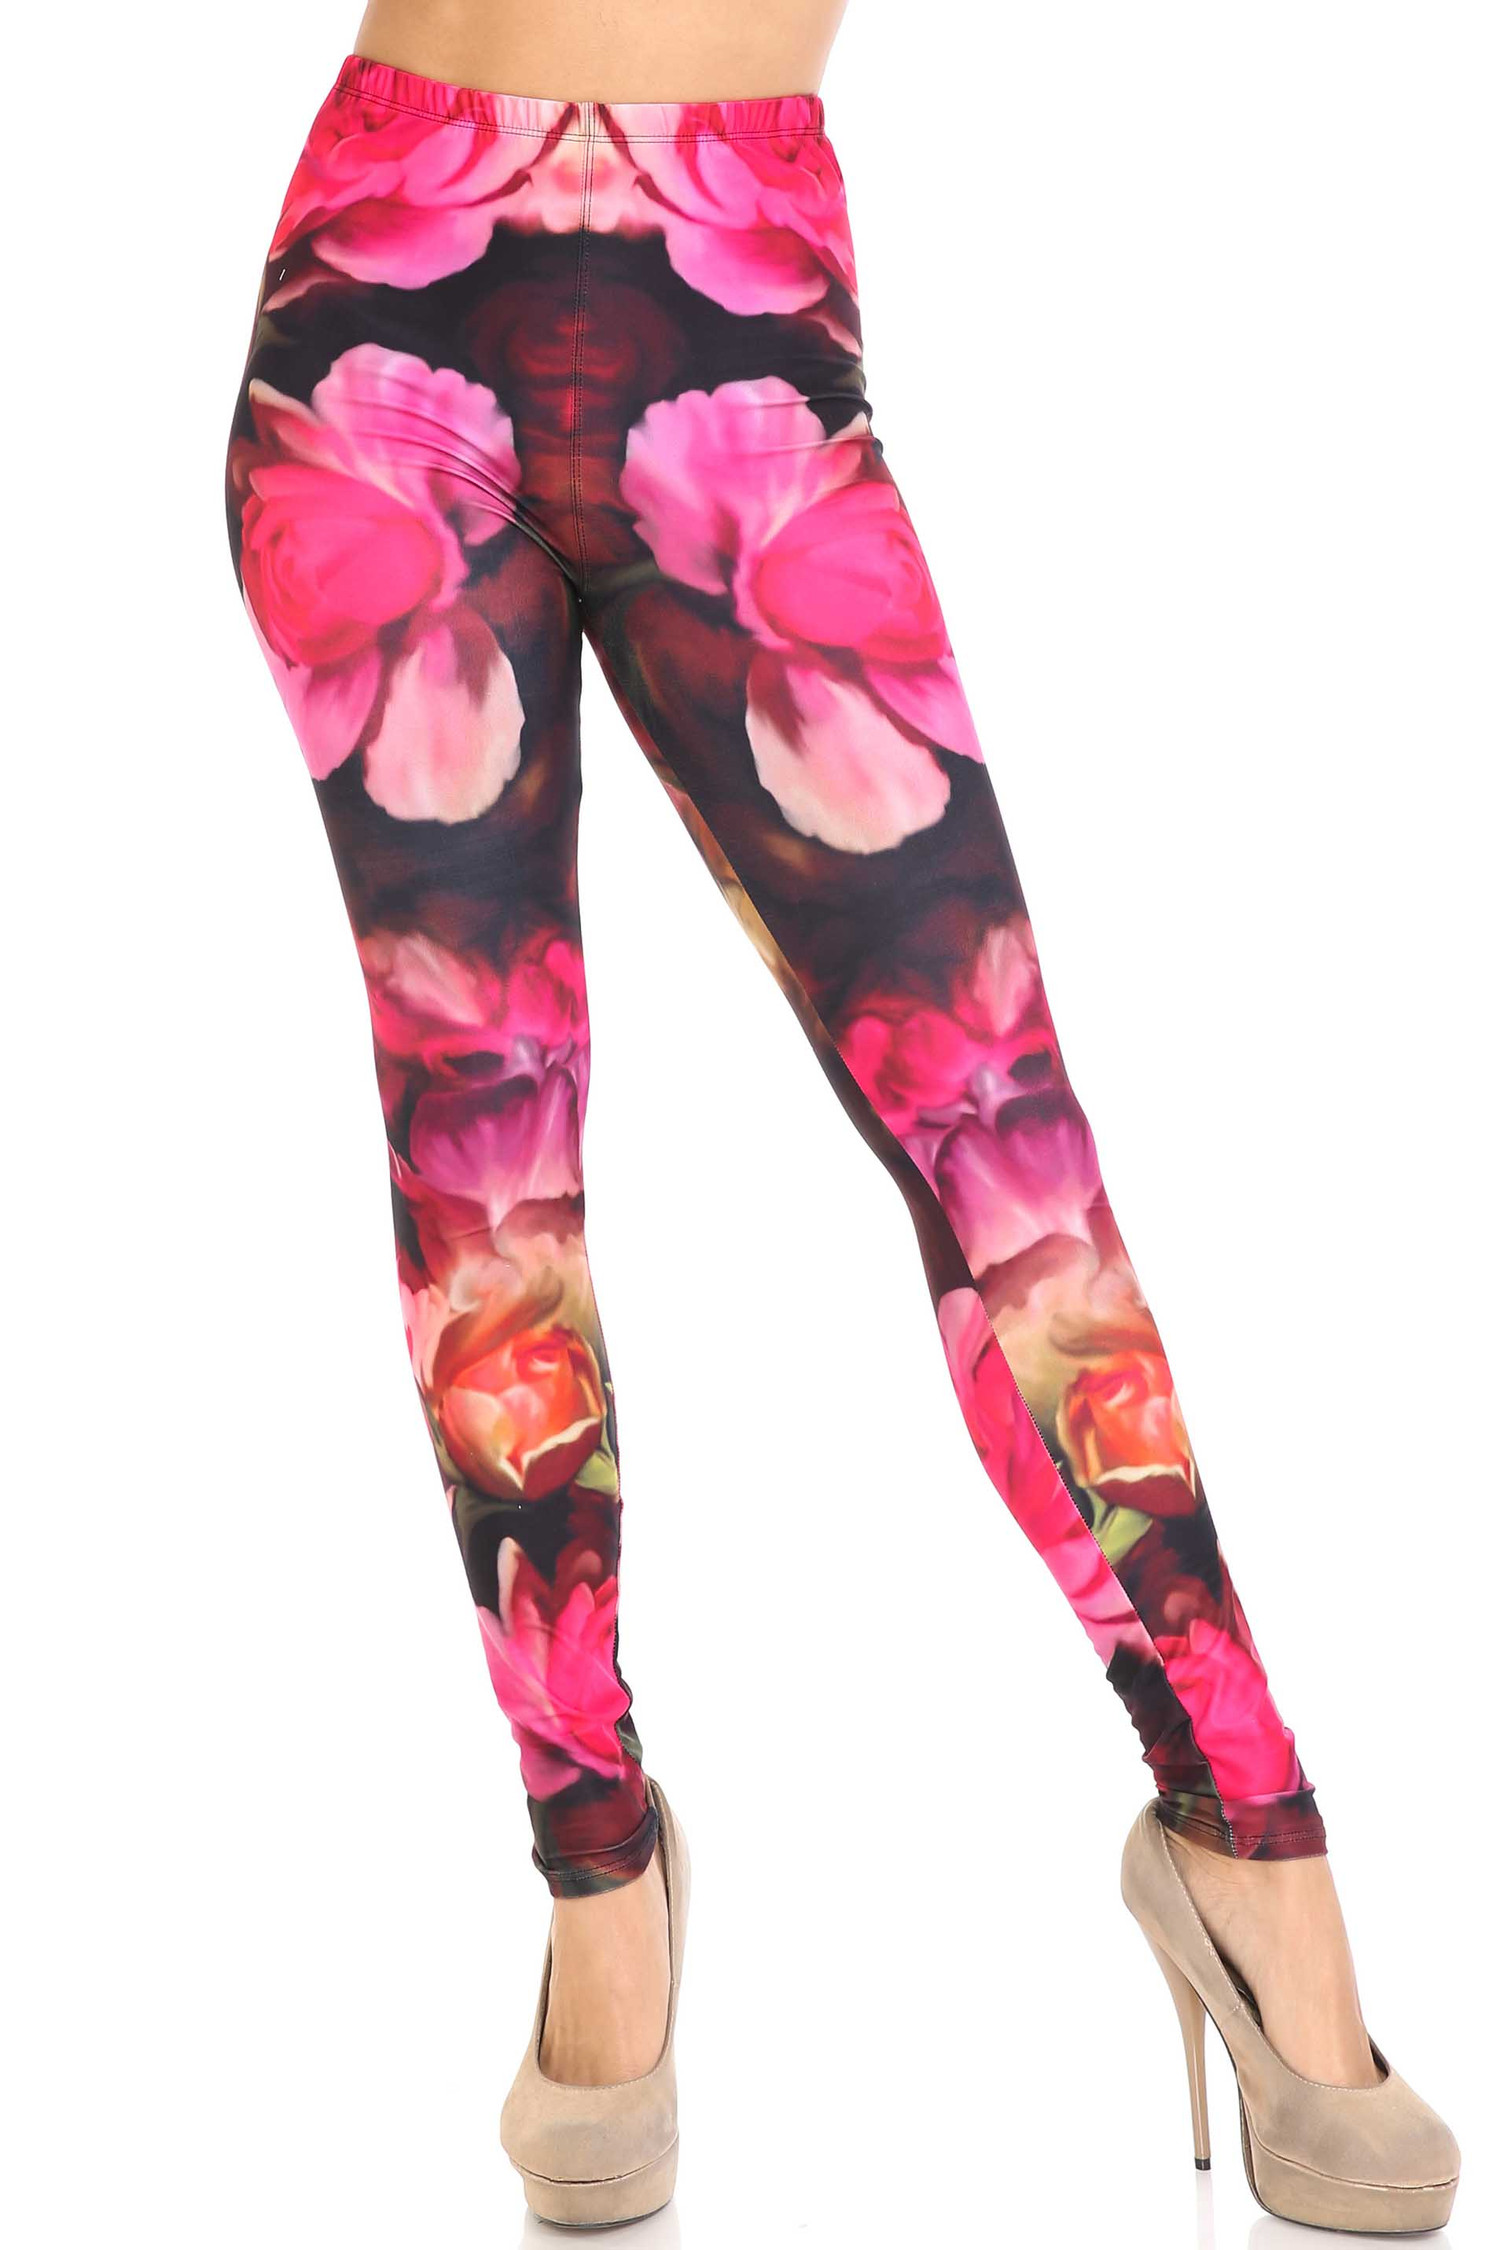 Creamy Soft Vintage Rose Extra Plus Size Leggings - 3X-5X - USA Fashion™